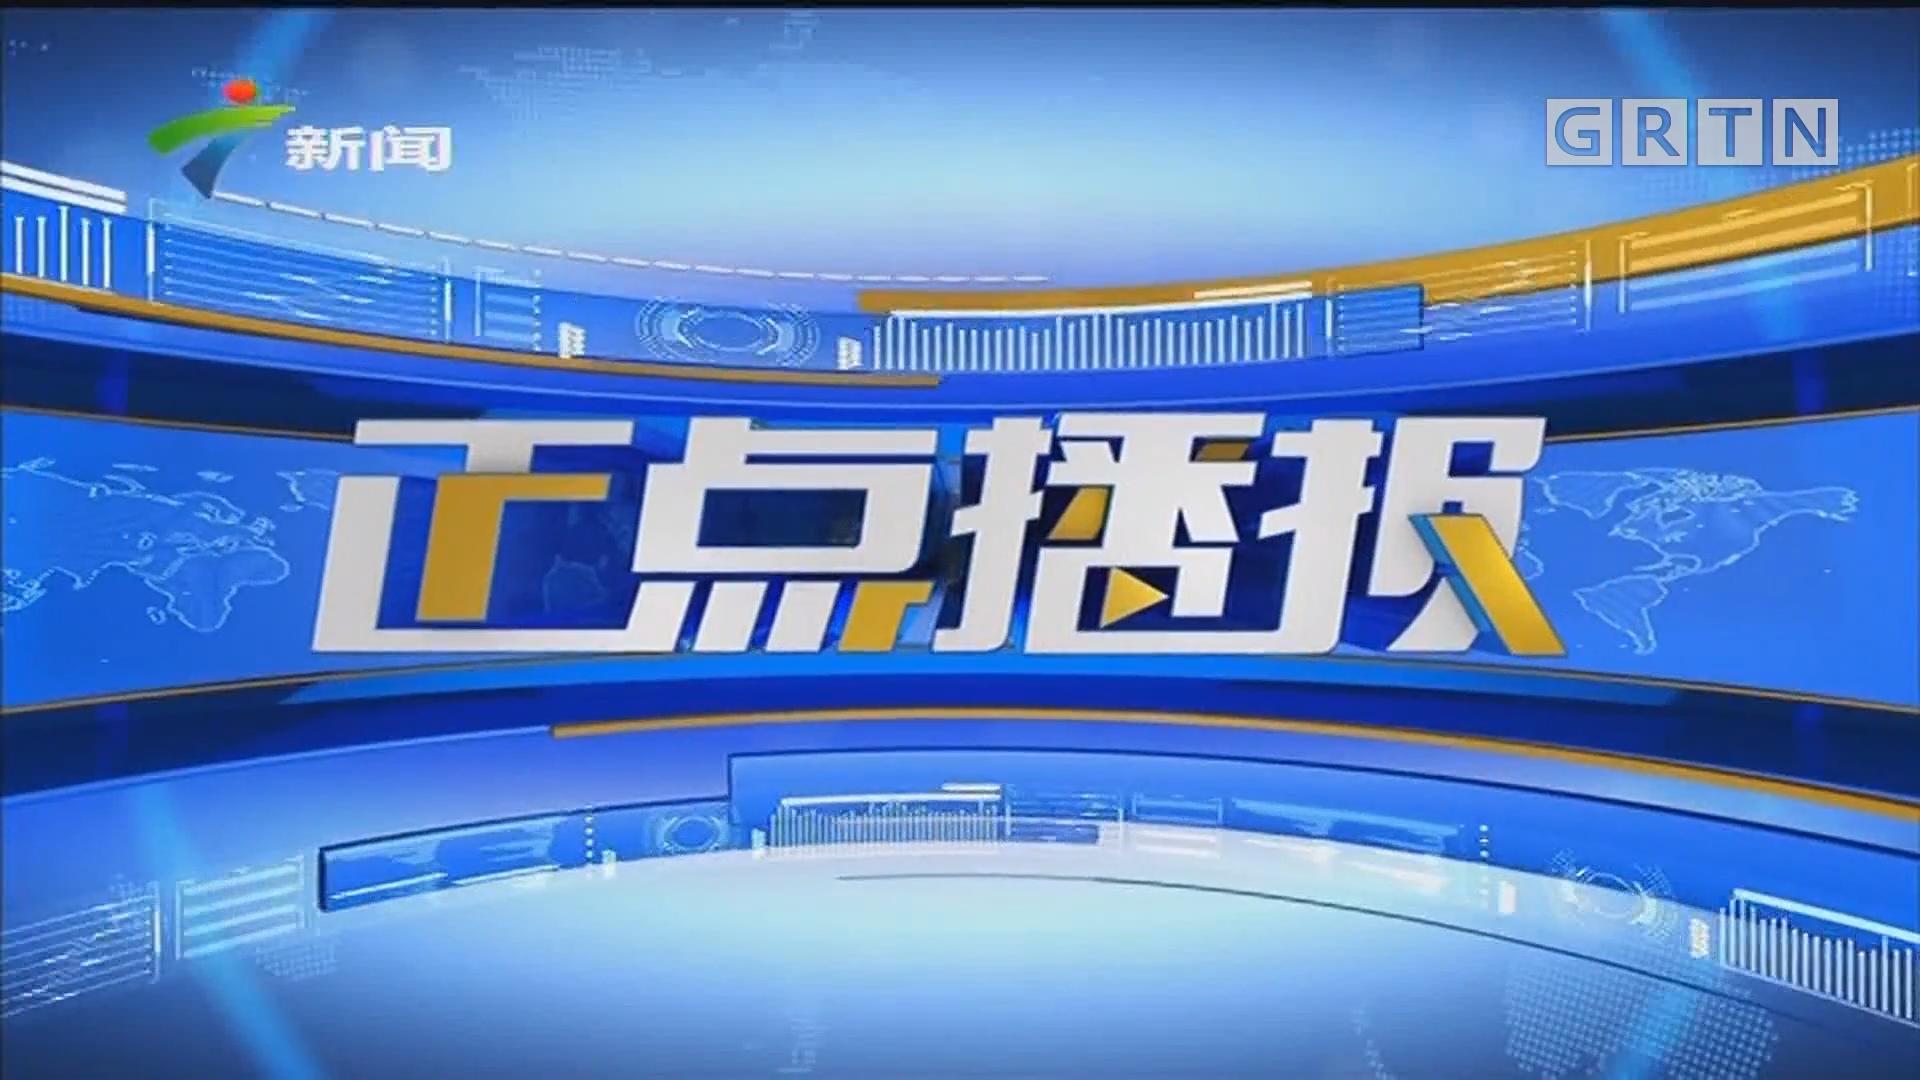 [HD][2019-11-04]正点播报:第二届进博会明天开幕:转型升级 汽车展区新亮点